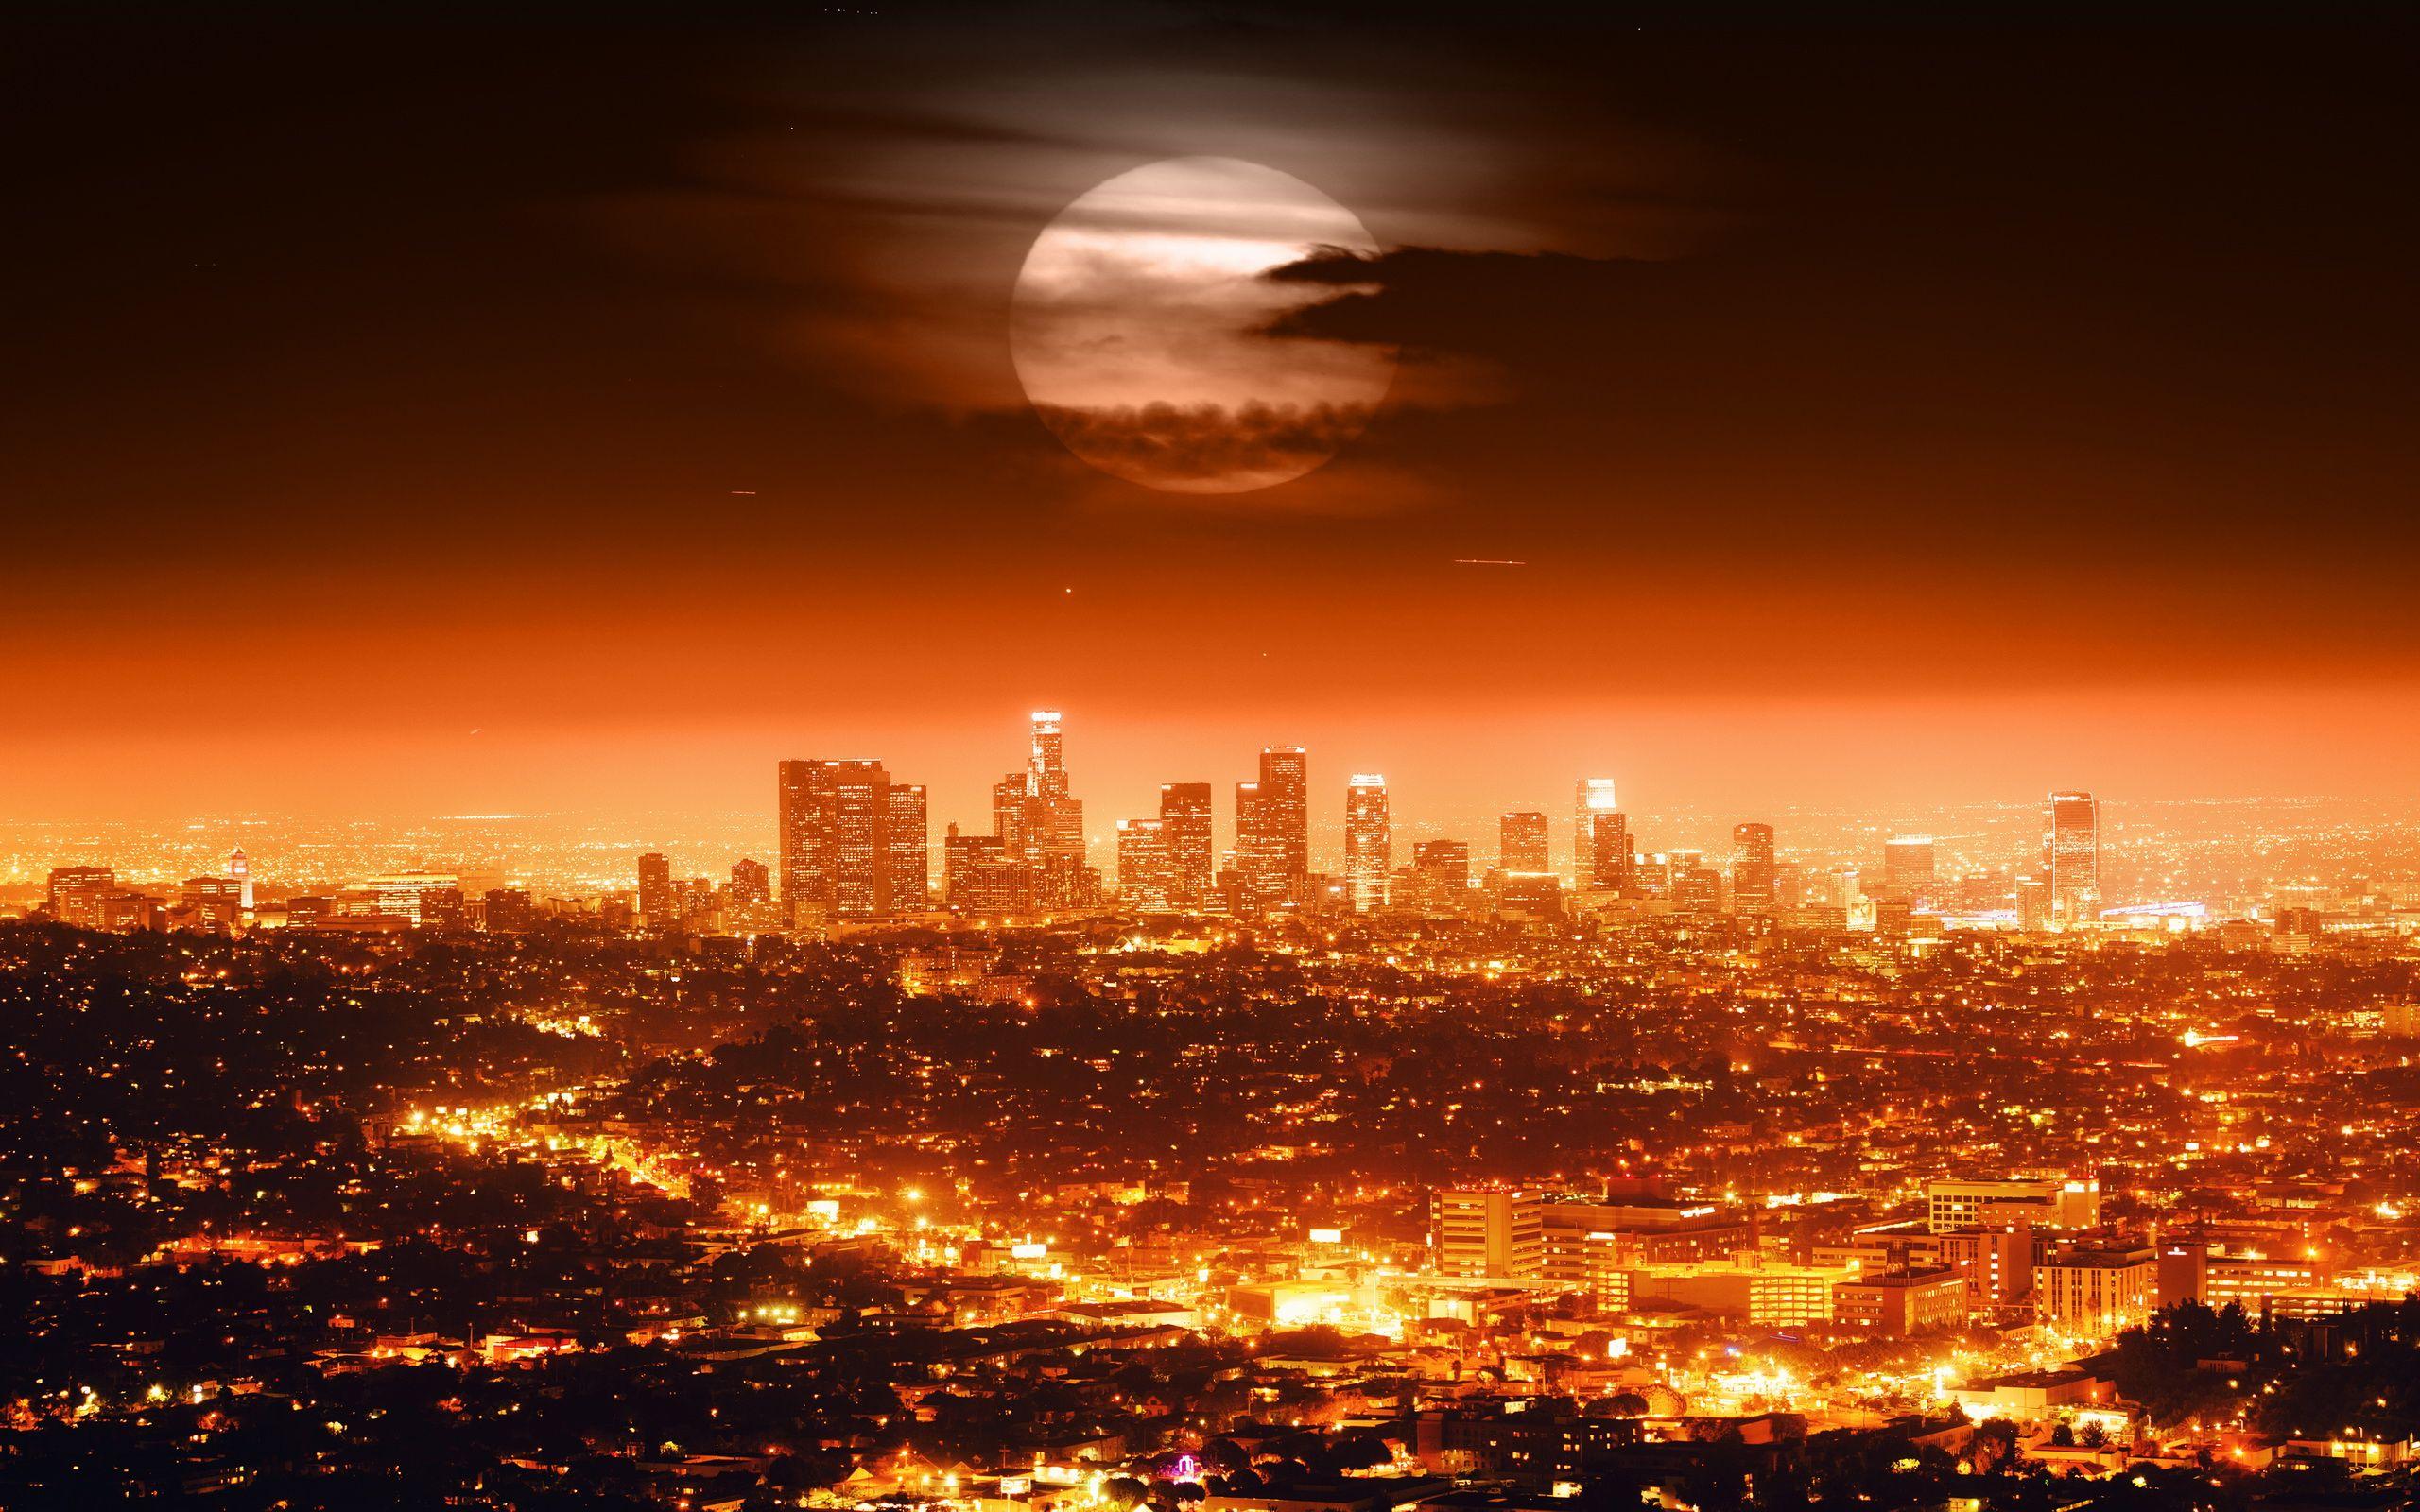 City Of Los Angeles Paysage Nocturne Fond D Ecran Los Angeles Skyline De Los Angeles